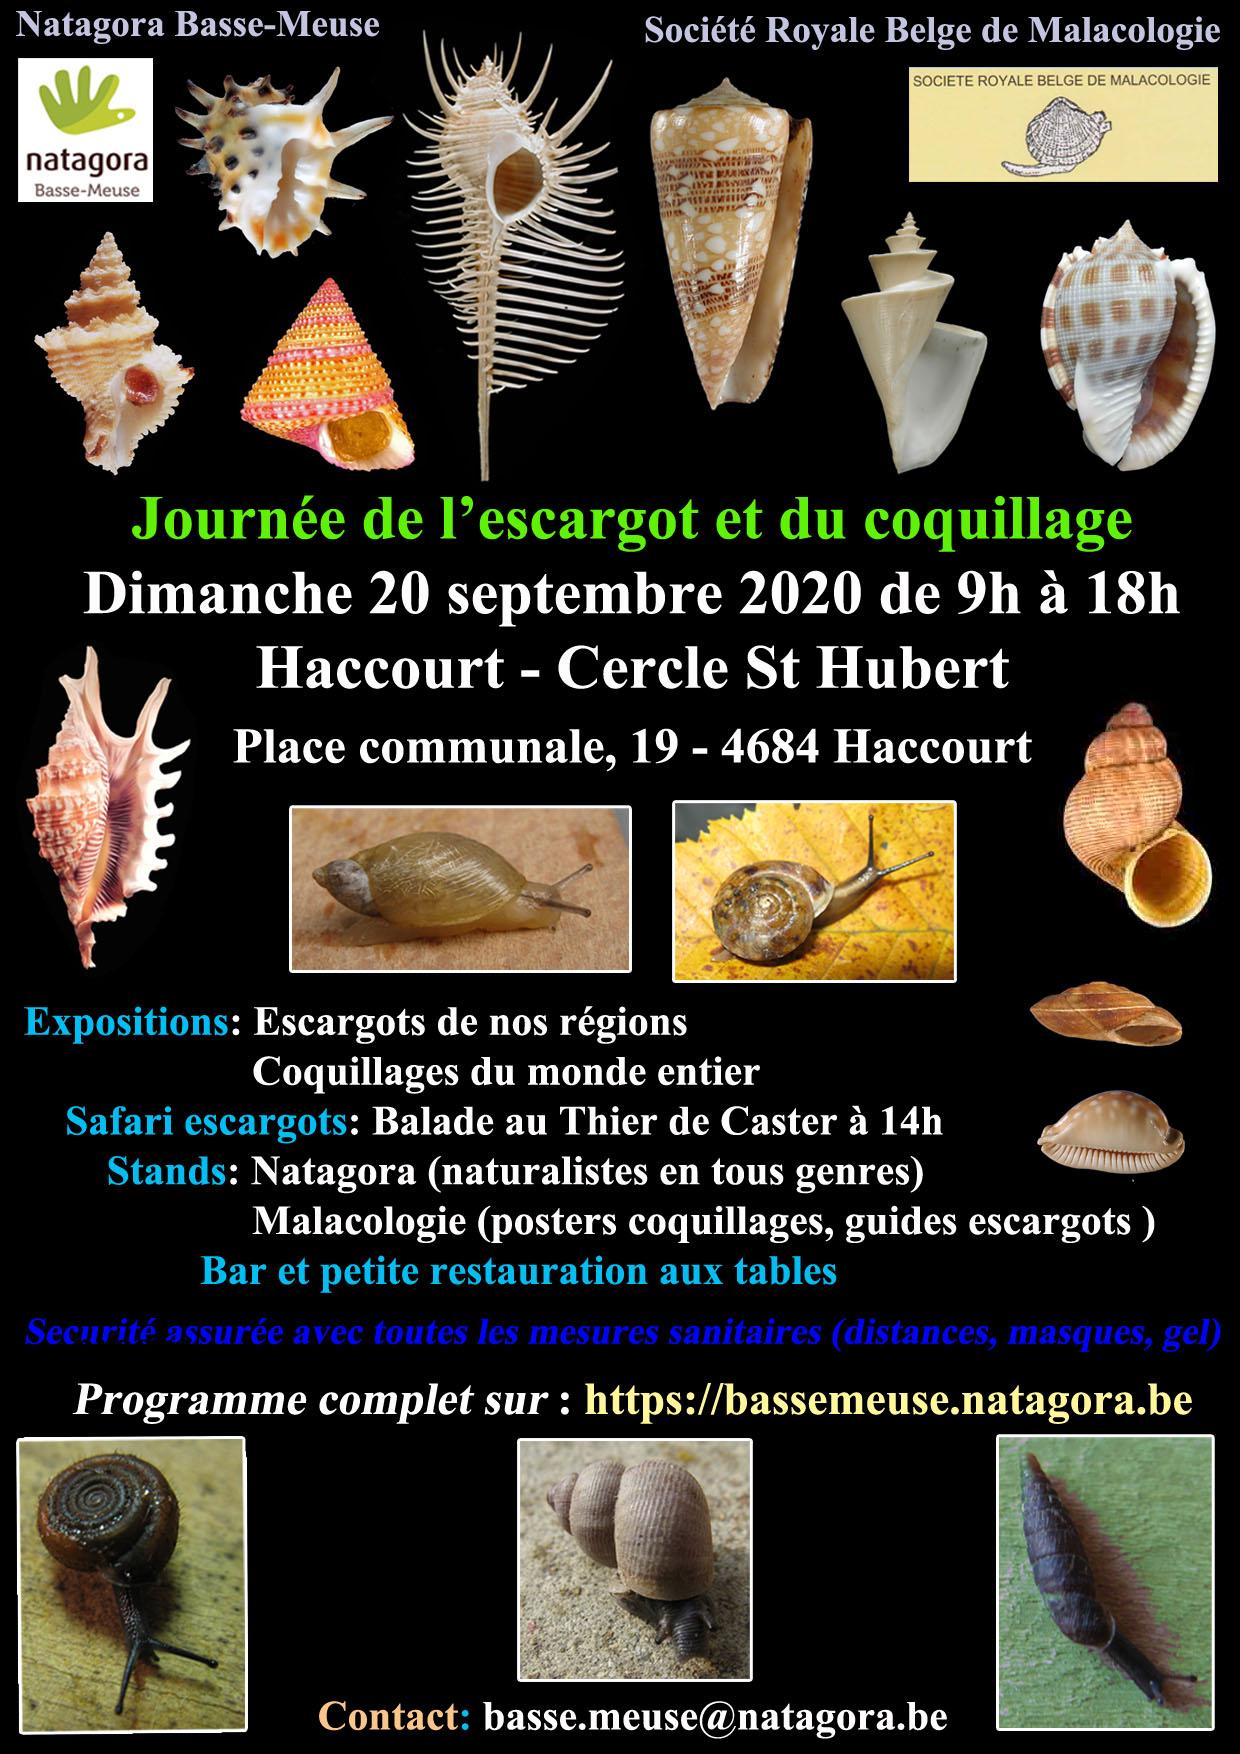 rencontres internationales du coquillage 2020)